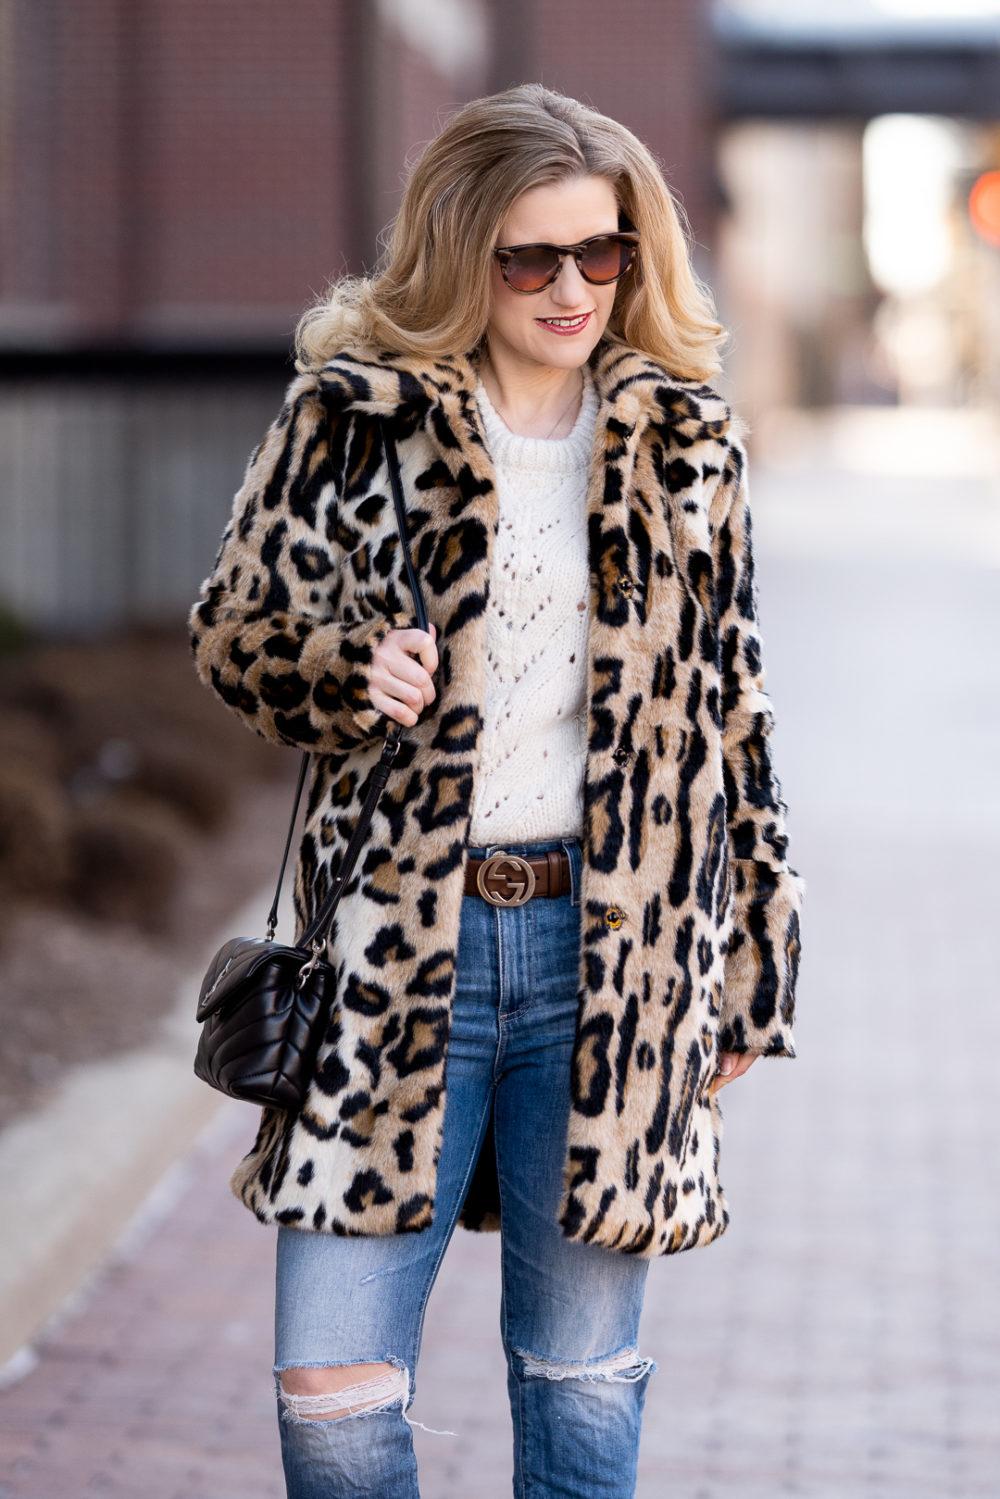 Petite Fashion Blog | Petite Style | Kensie Leopard Coat | Topshop Pointelle Sweater | Gucci Belt | AG Isabella Crop Jeans | YSL Lou Lou Toy Crossbody Bag